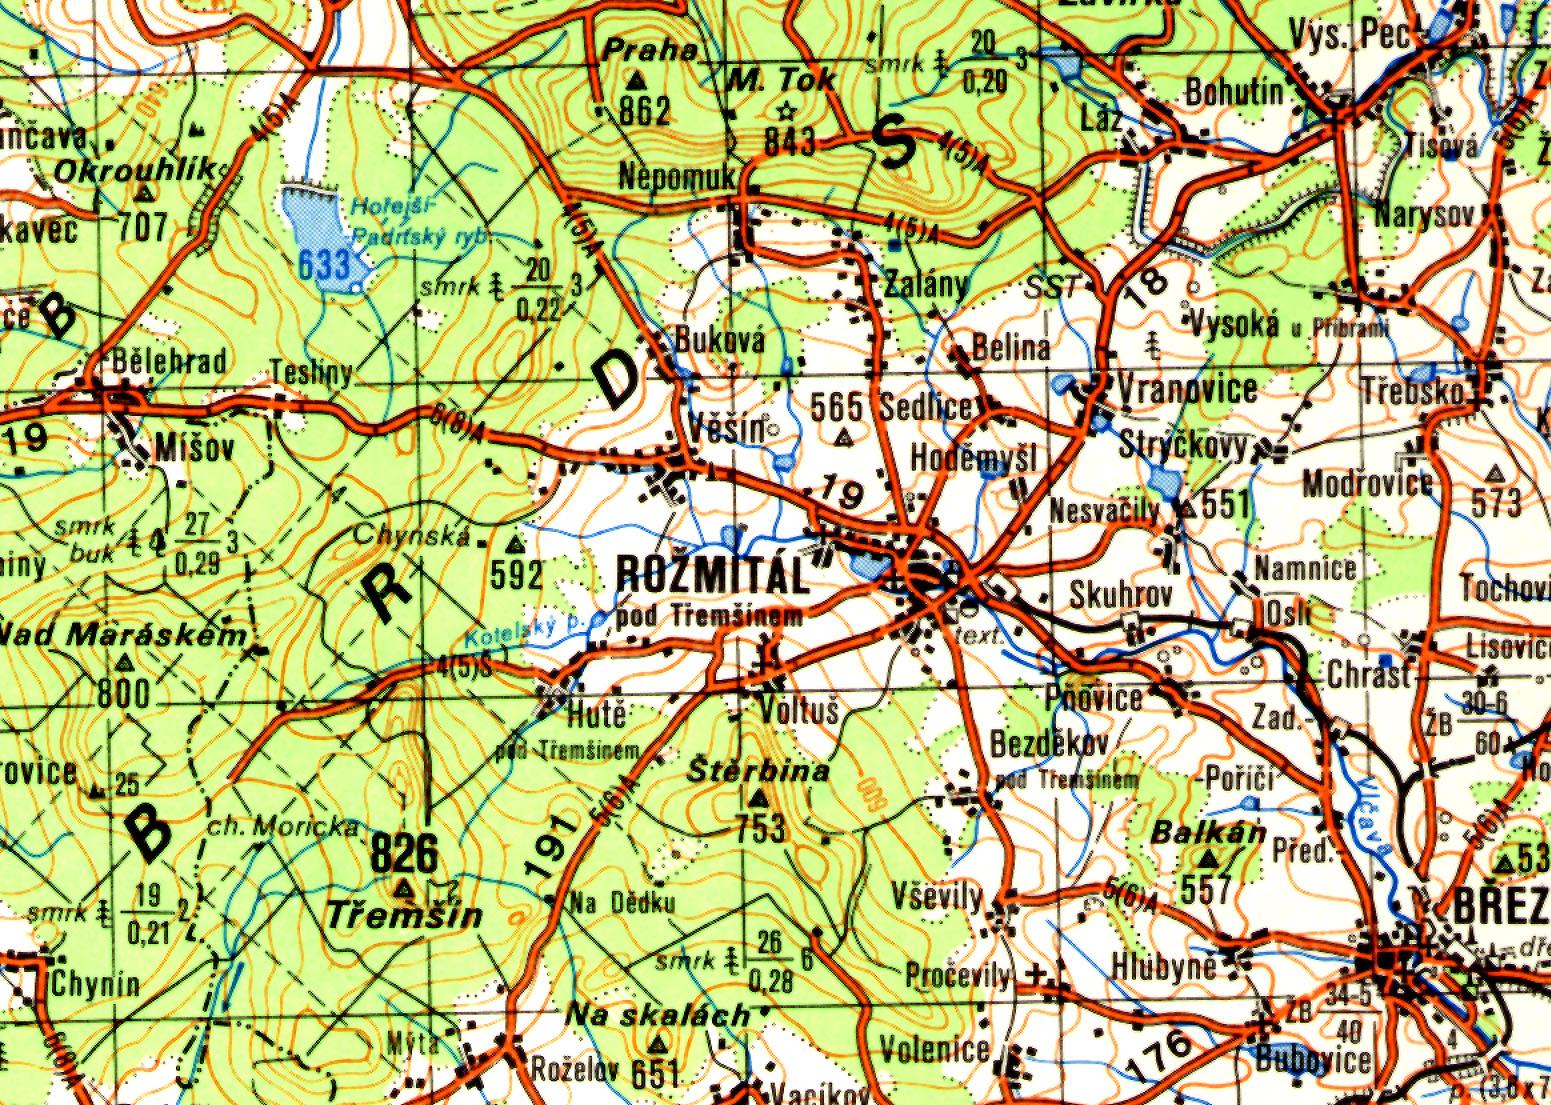 Topograficke Mapovani Naseho Uzemi Ve 20 Stoleti